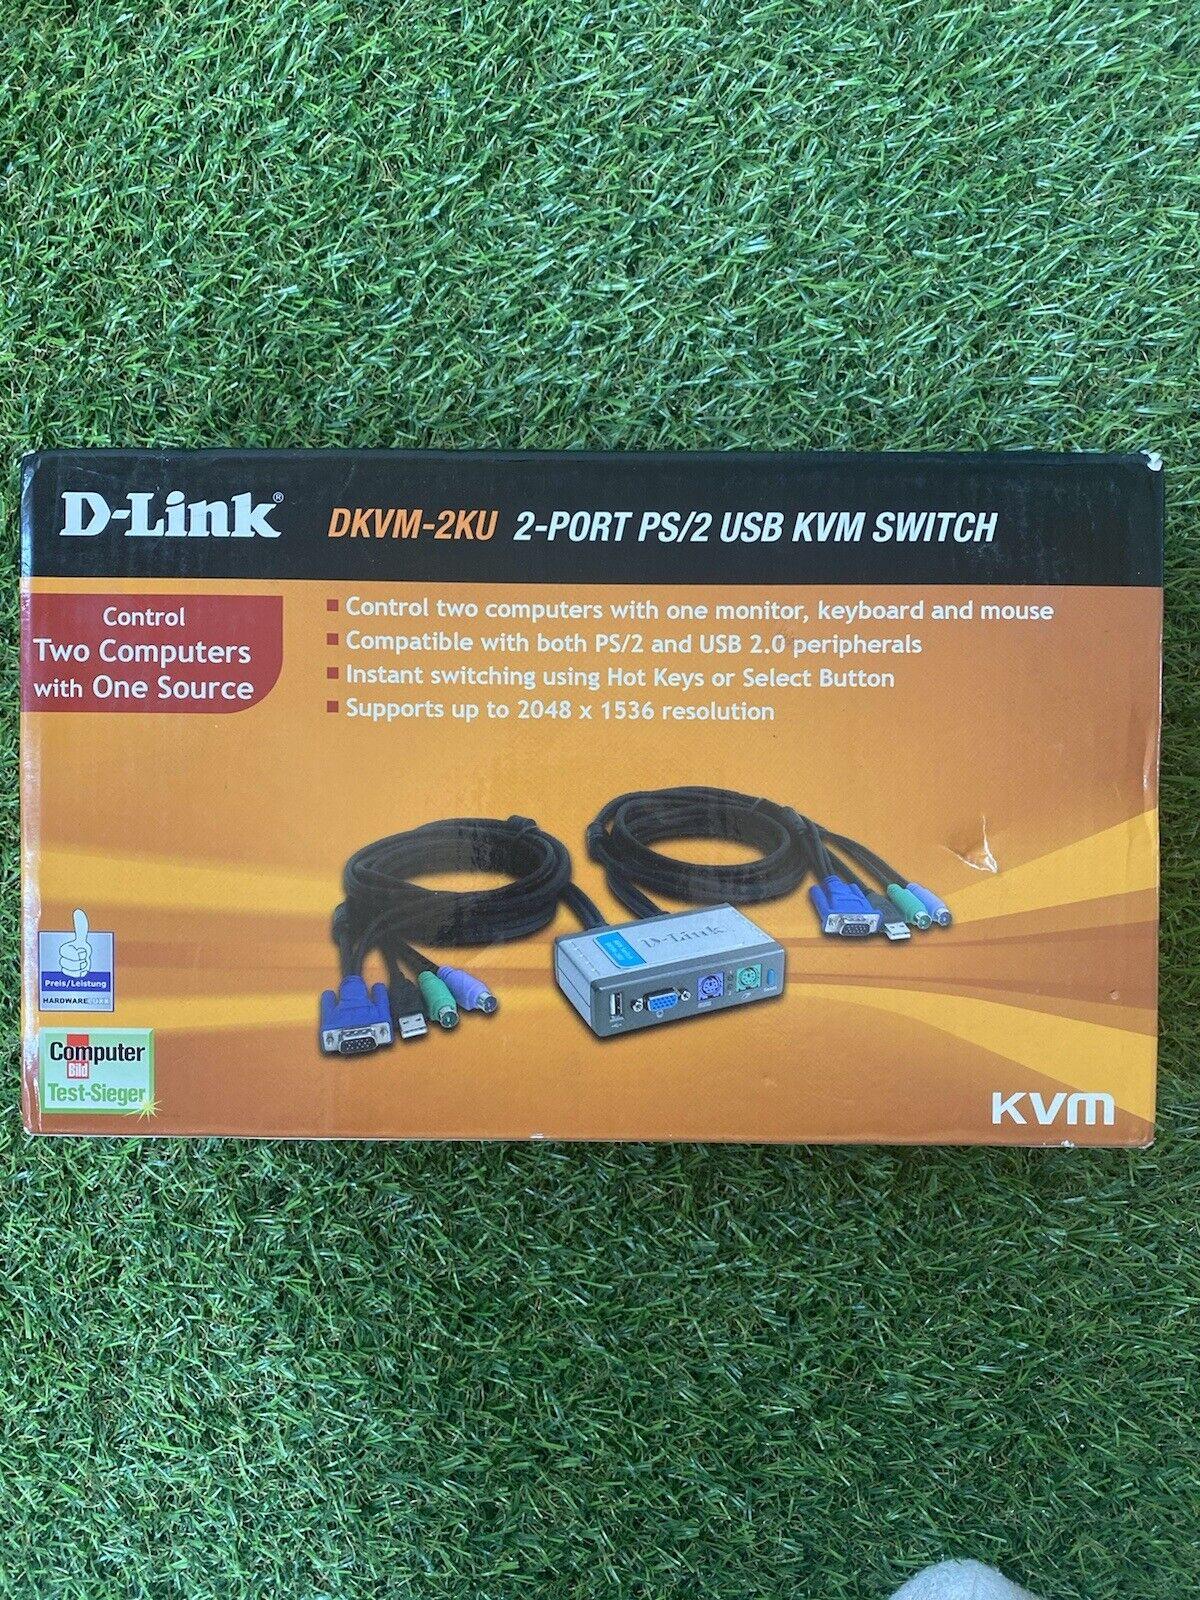 D-link Dkvm-2ku 2port ps/2 USBKVM Switch Sealed